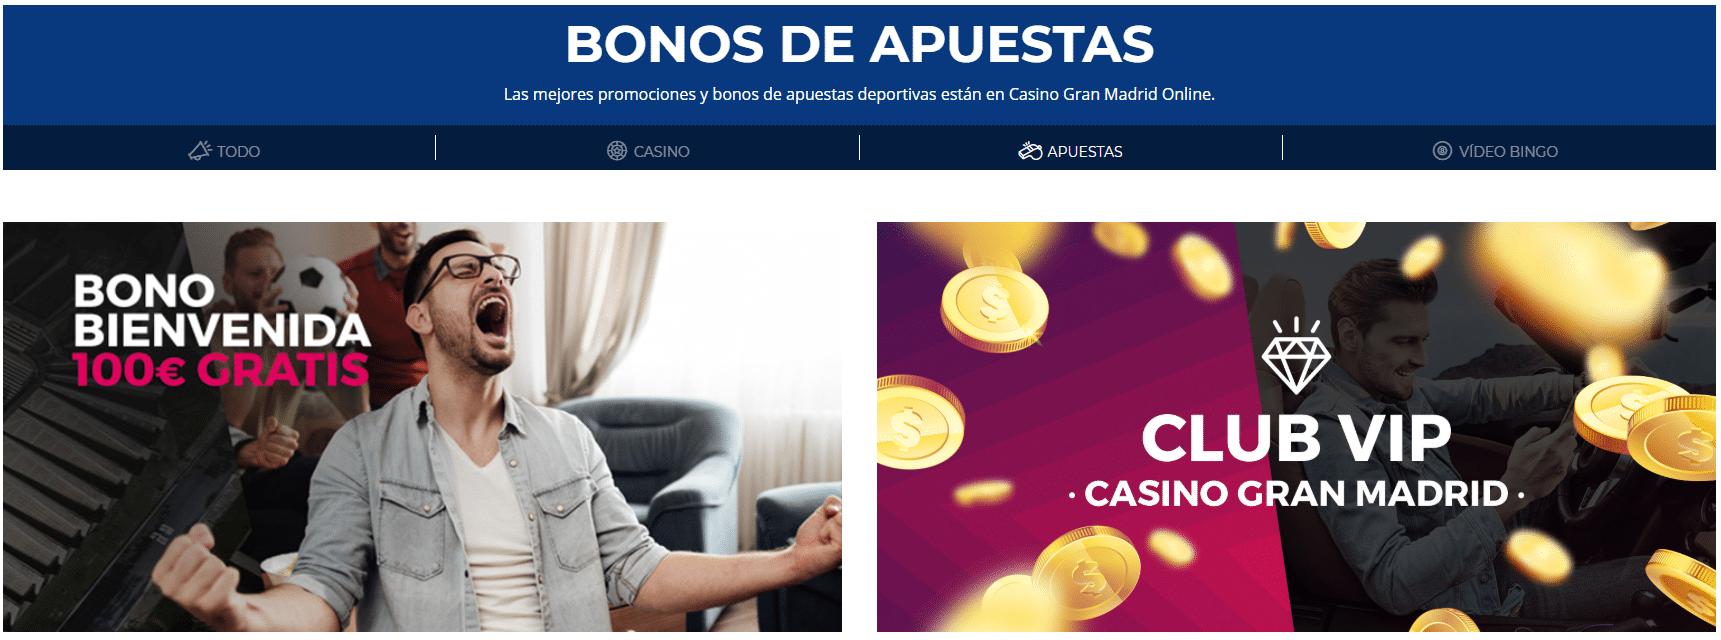 Casino gran Madrid online bono bet365 Paraguay 626255